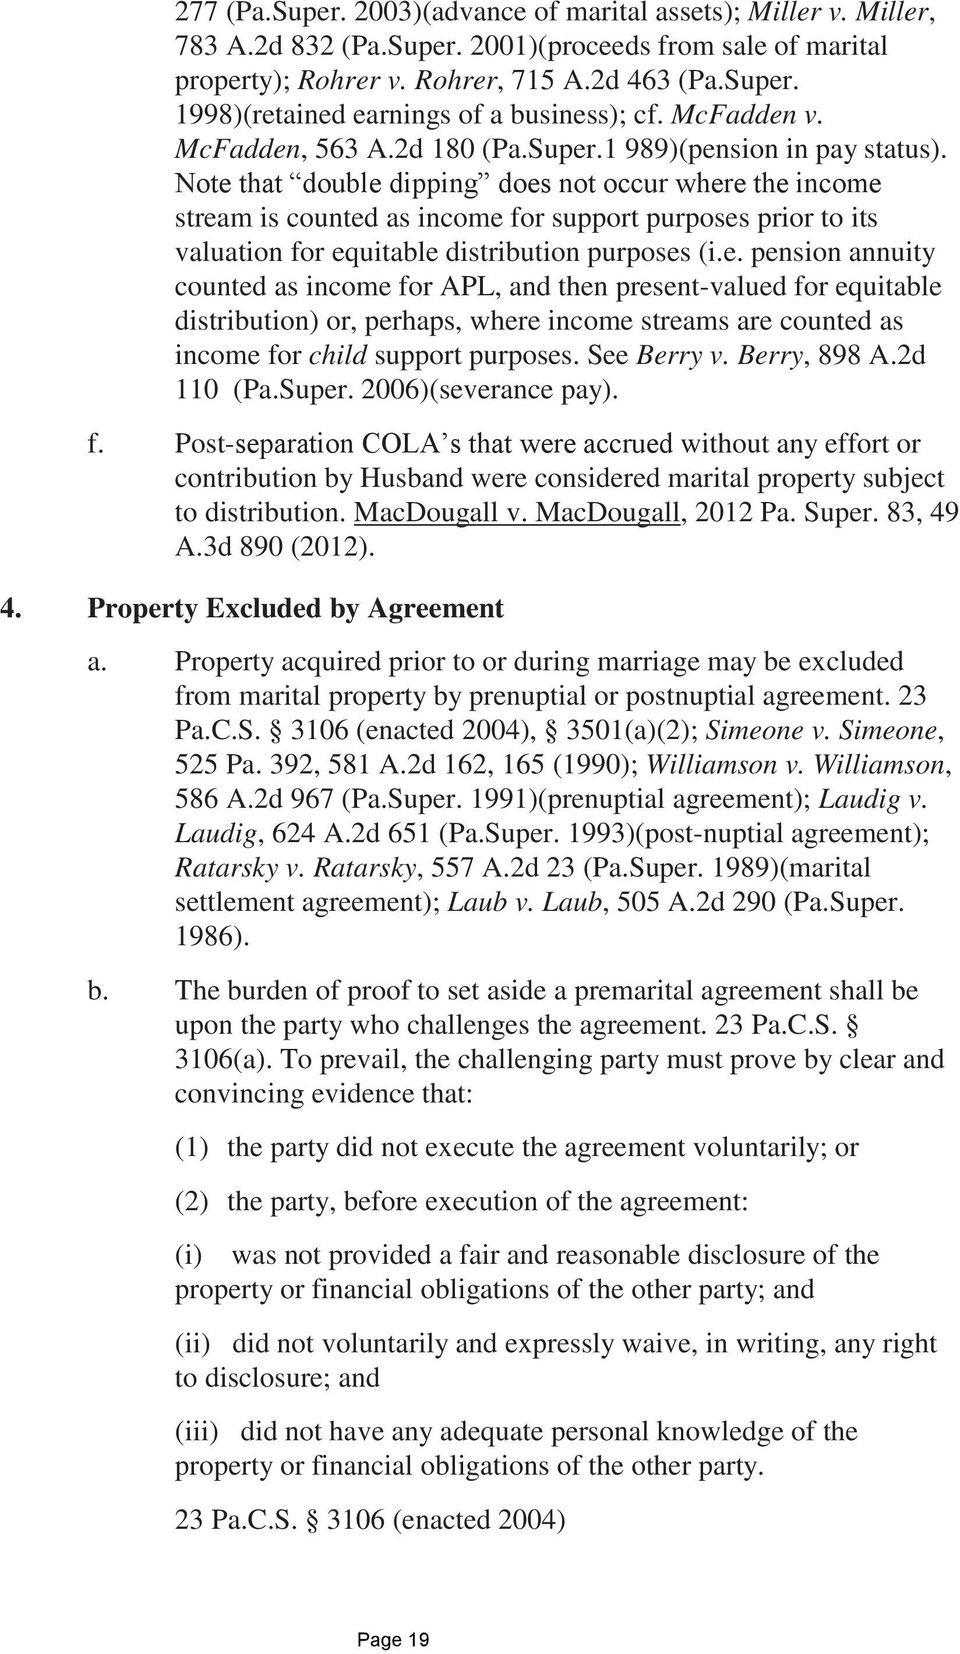 Advanced Divorce Training Equitable Distribution  Pdf With Regard To Equitable Distribution Worksheet Pa